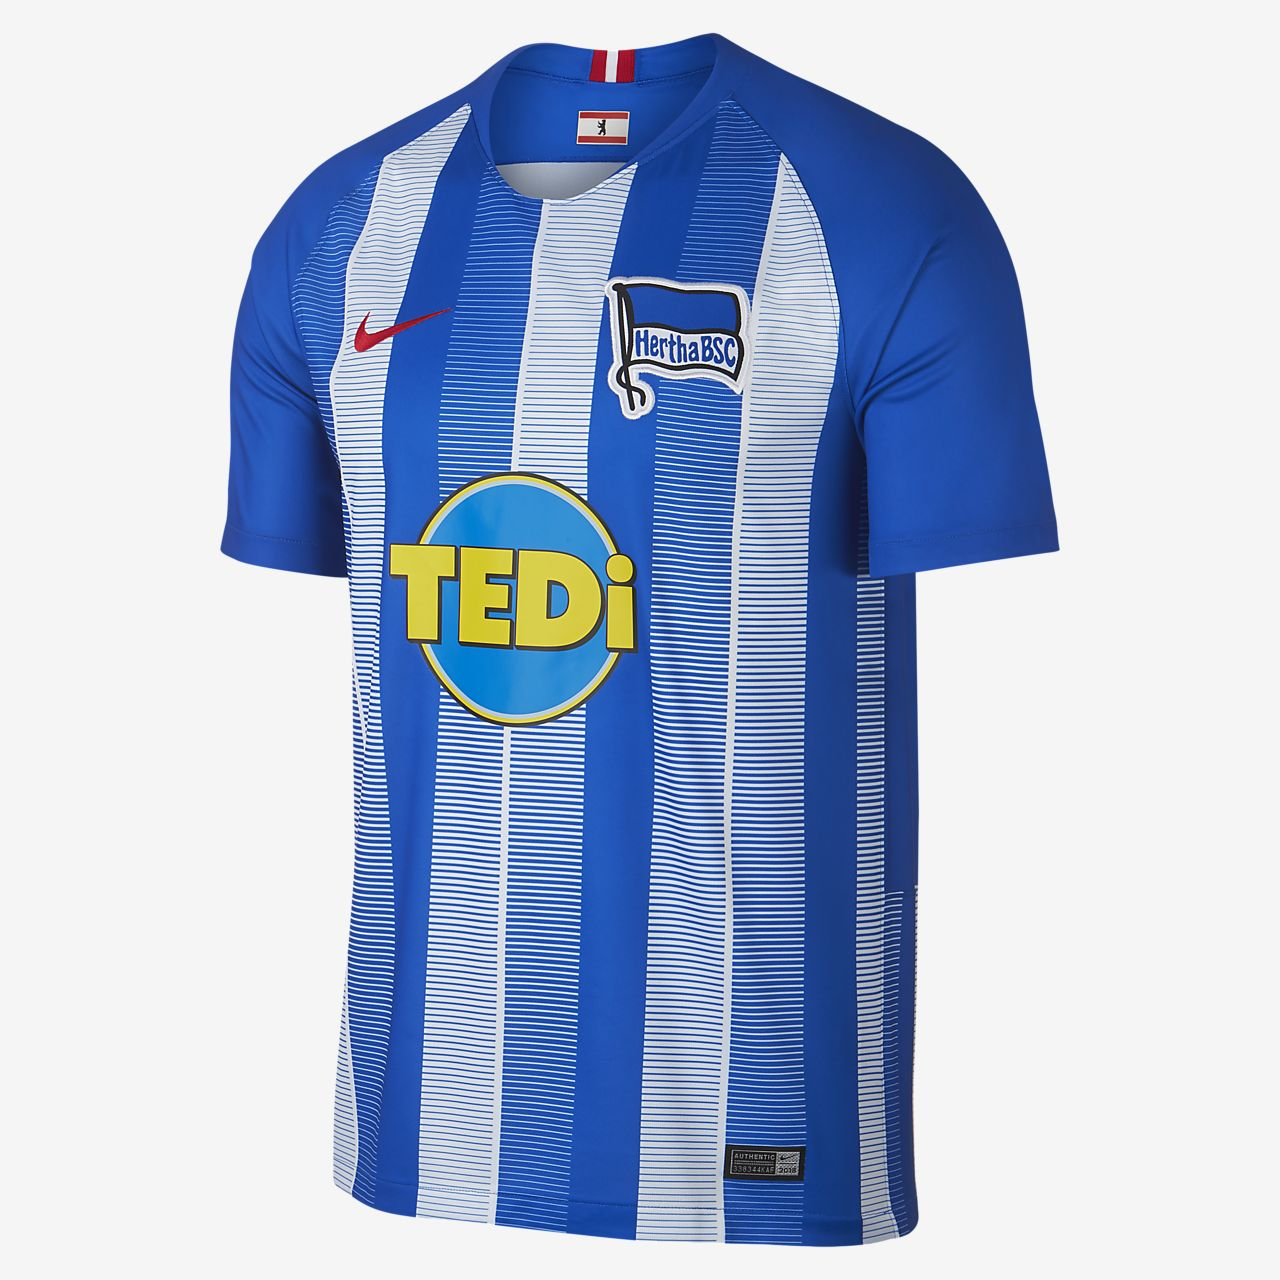 Camiseta de fútbol para hombre 2018 19 Hertha BSC Stadium. Nike.com MX 1aa7bd27c7009